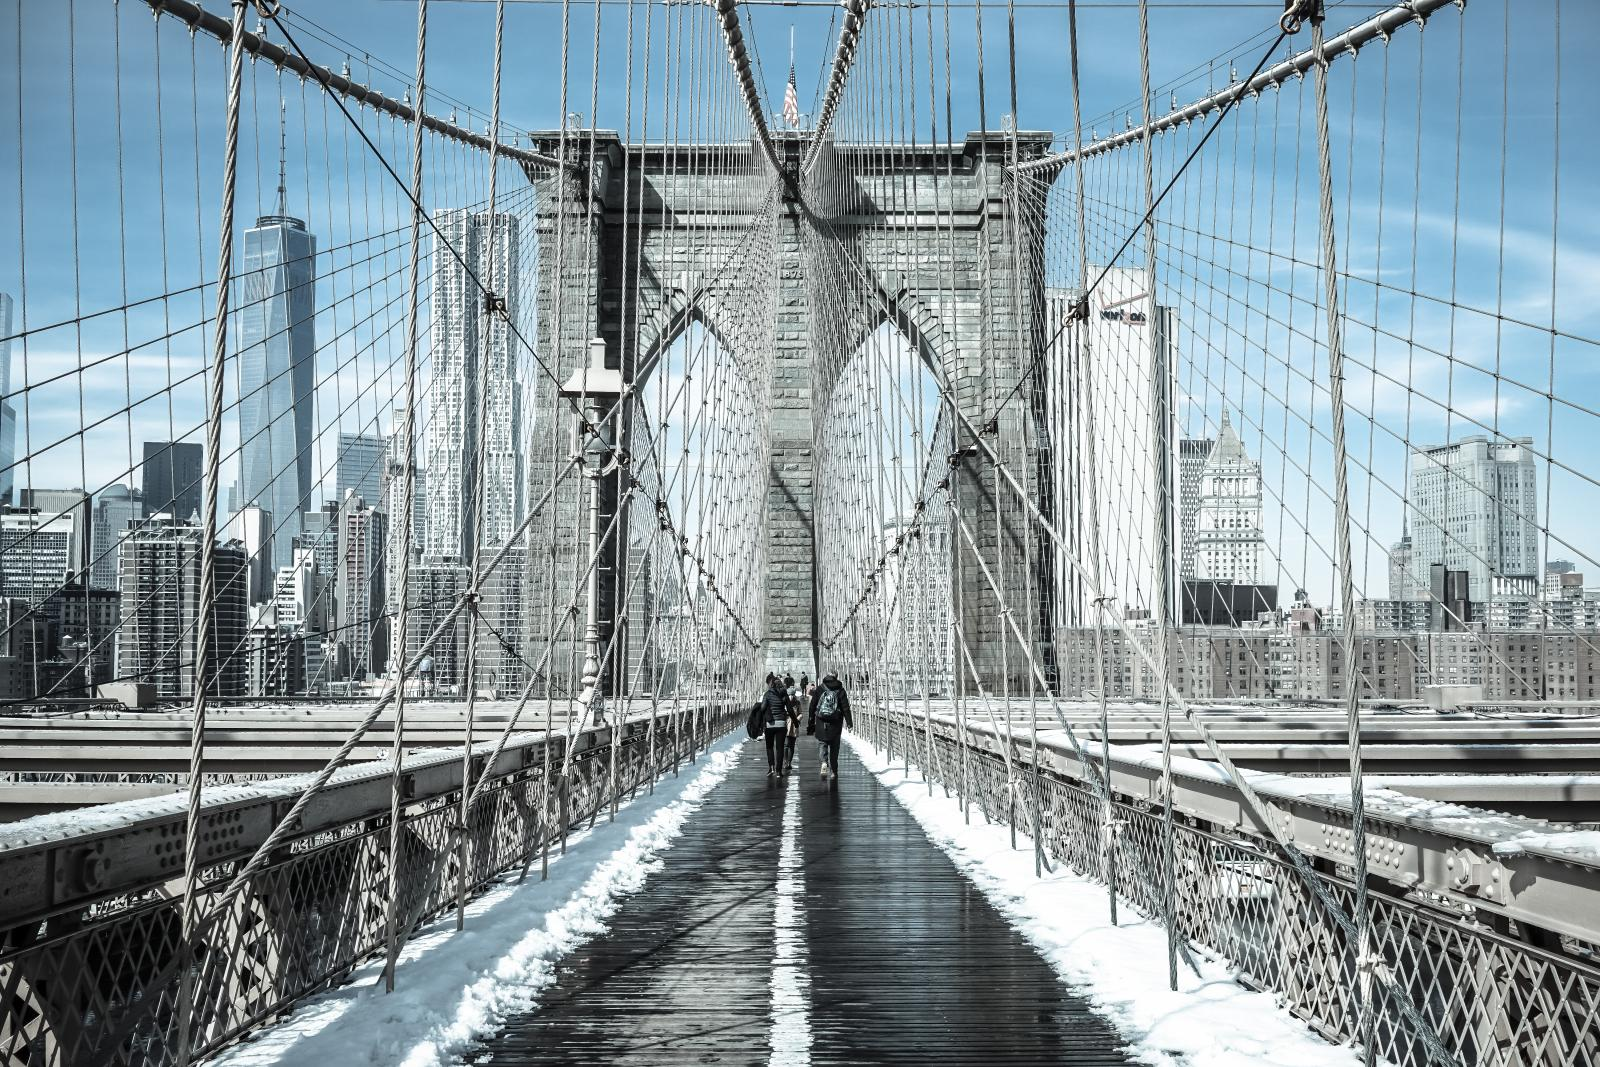 Winter in New York / Pedestrians cross snow-covered Brooklyn Bri